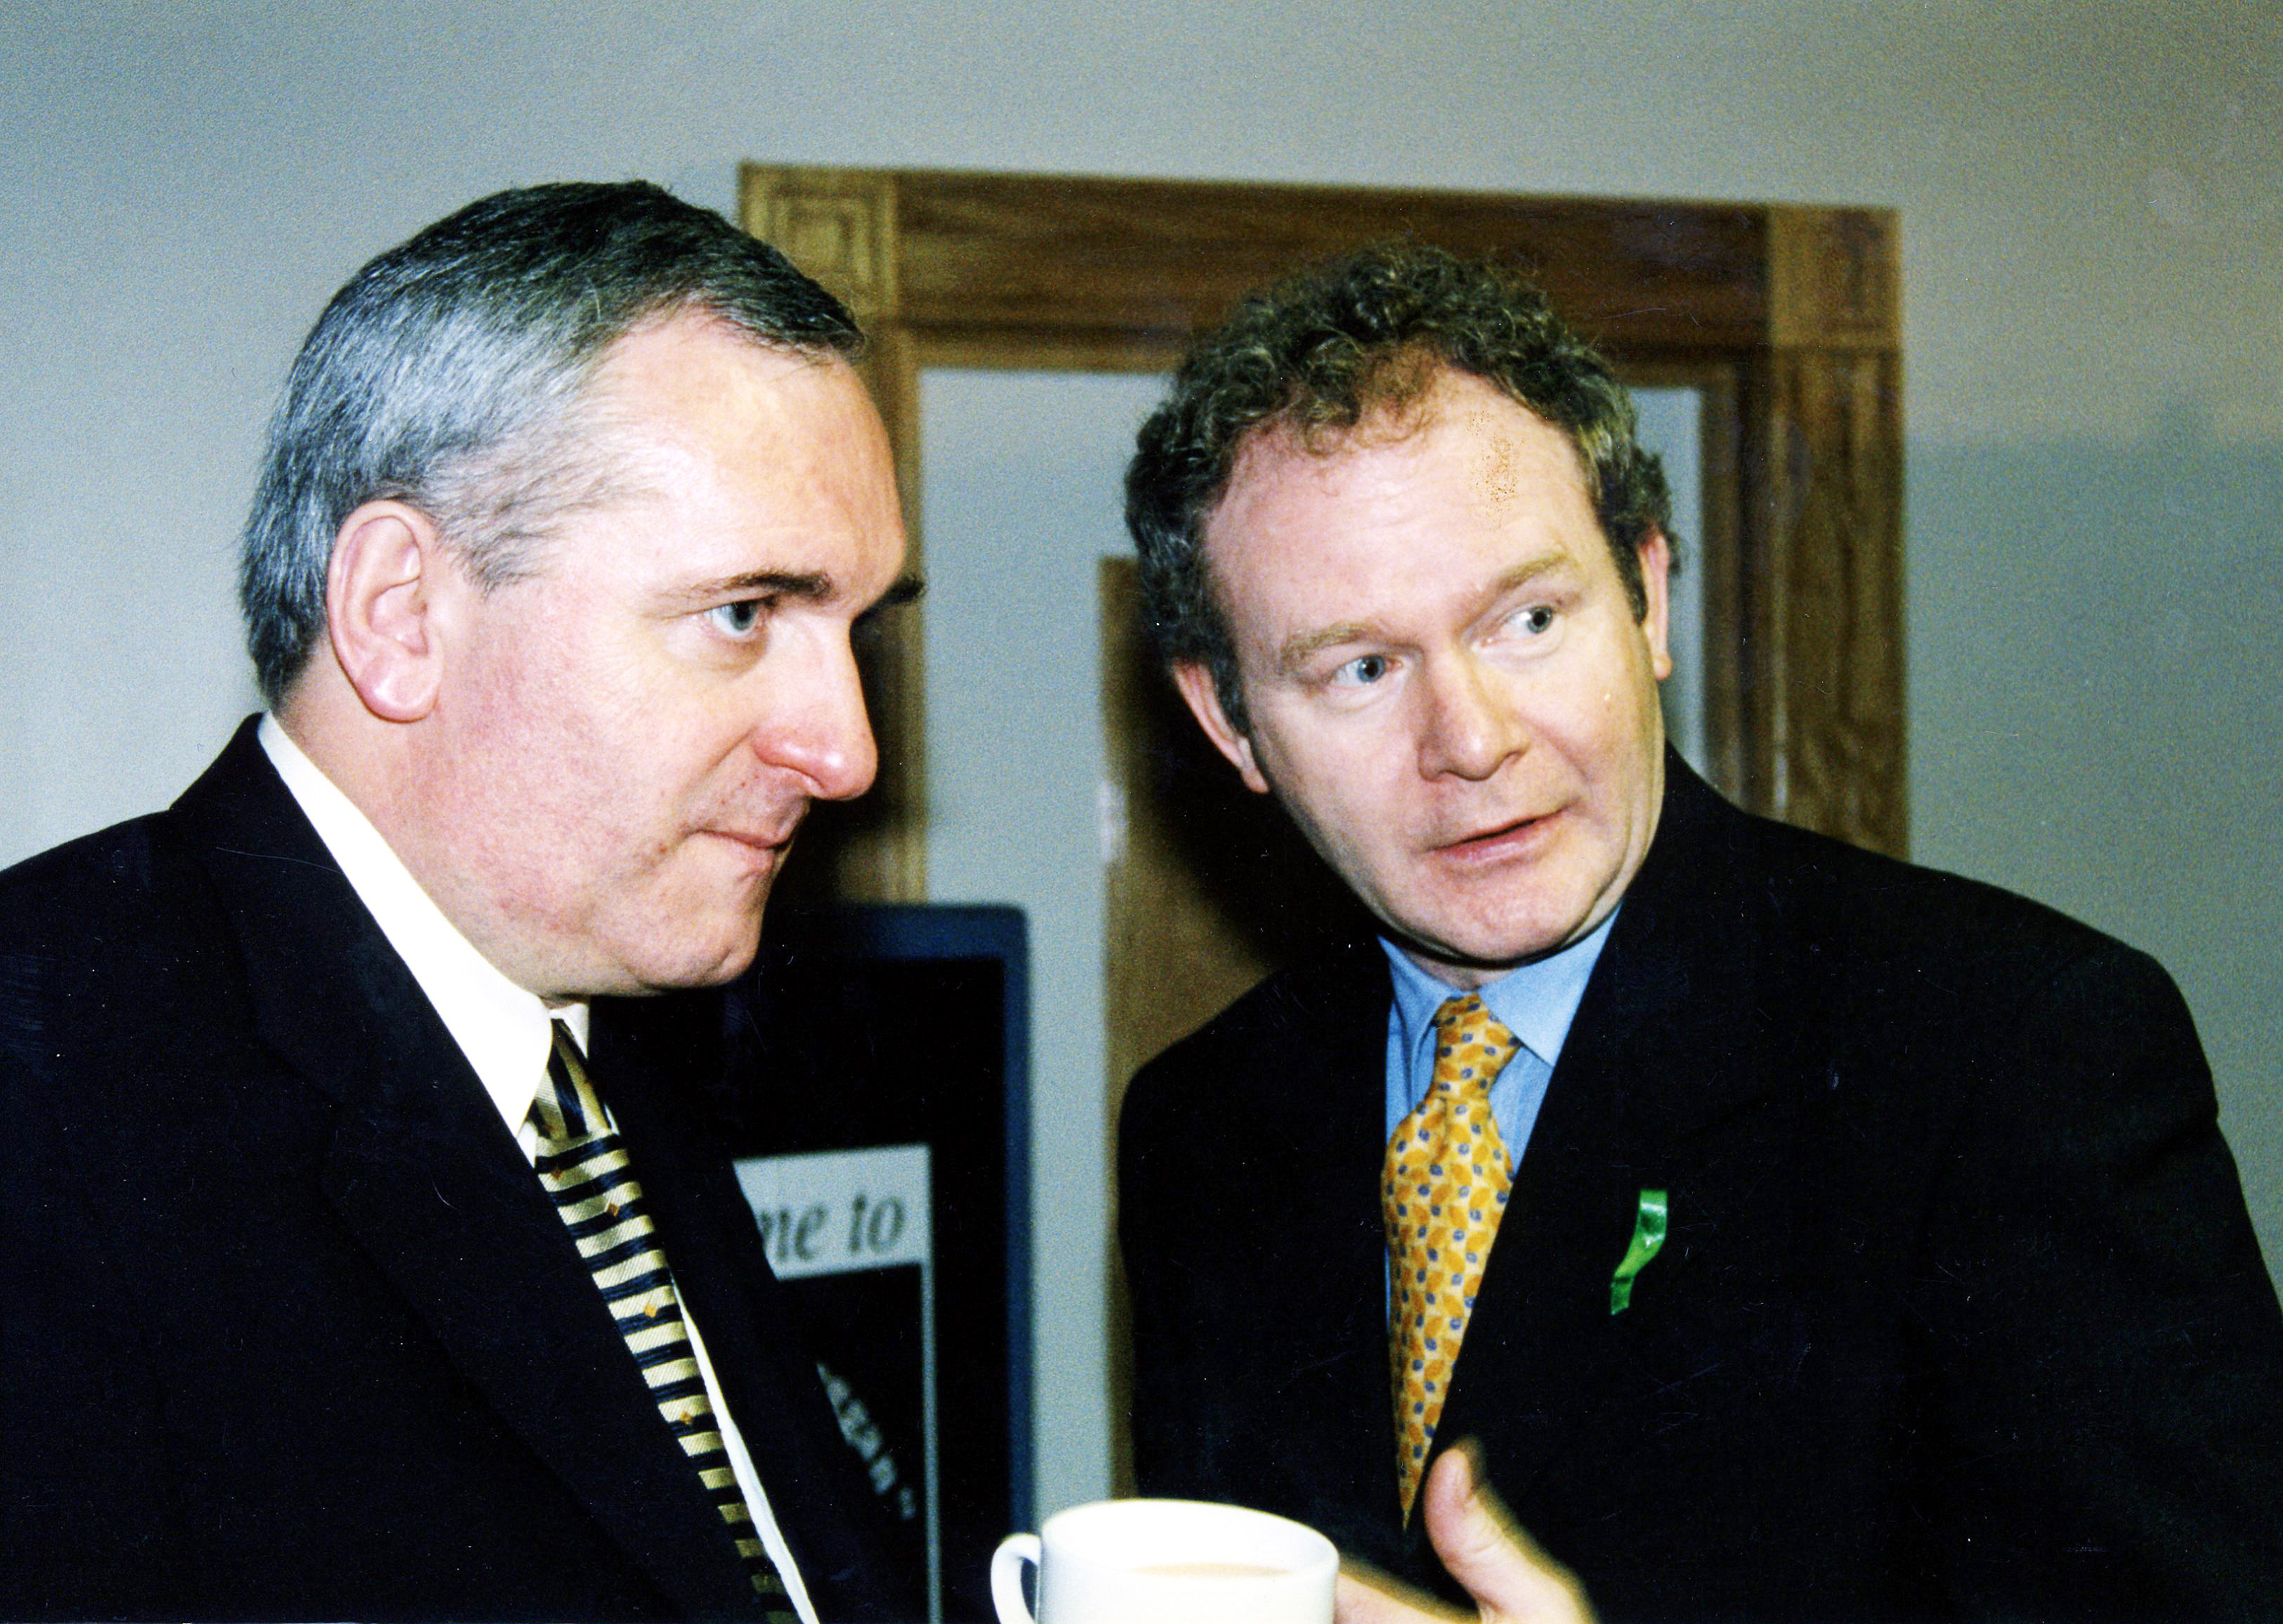 Martin-and-Bertie-Ahern